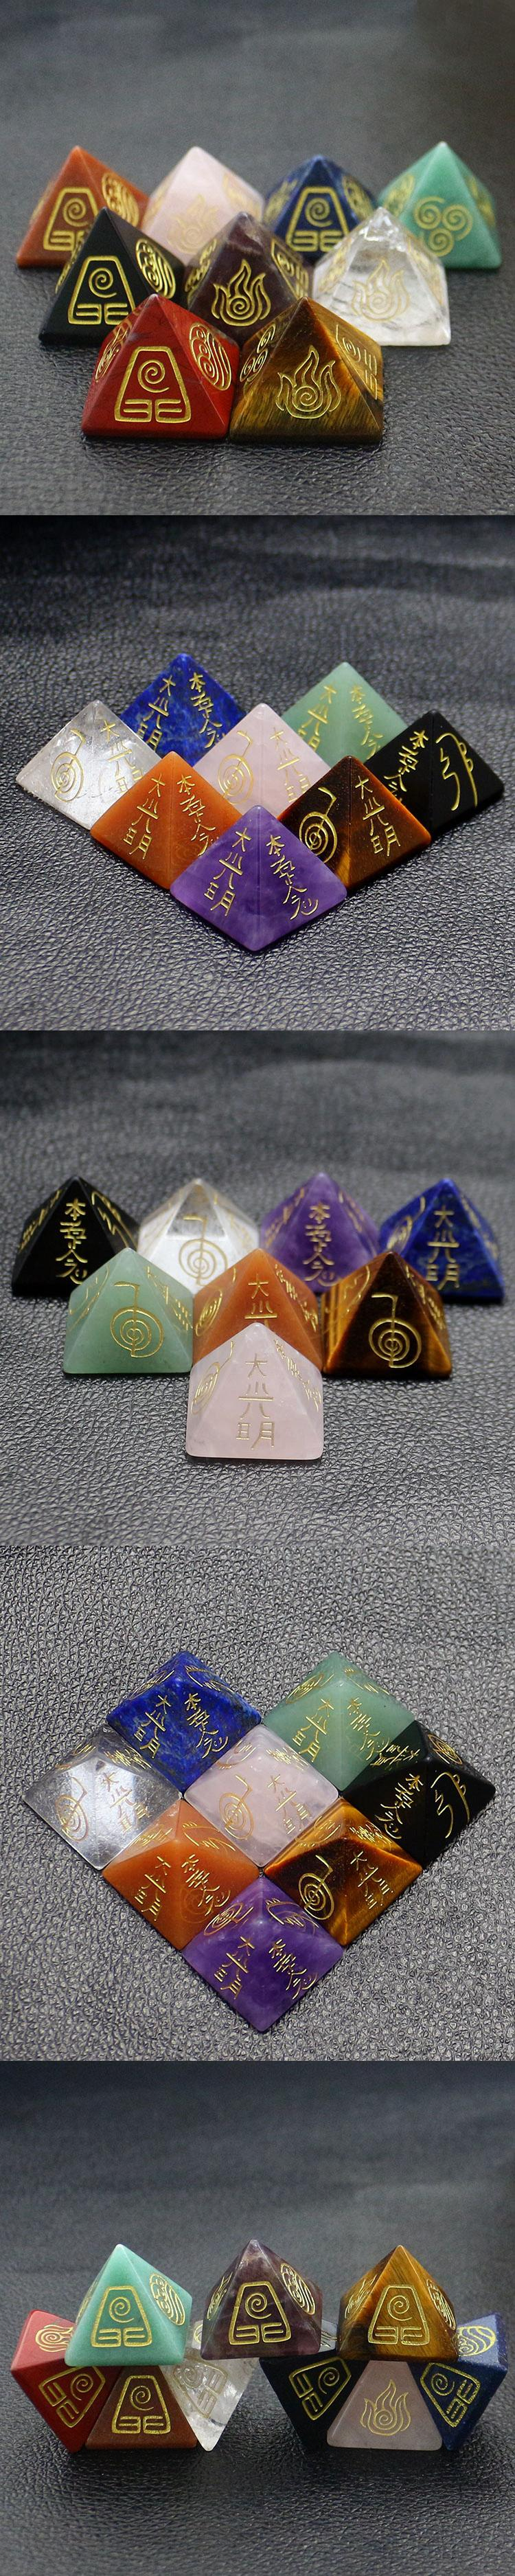 Feng Shui Stone Engraved Symbol Quartz Natural Crystal Chakra Reiki Healing Gemstone pyramid Crystals Stone